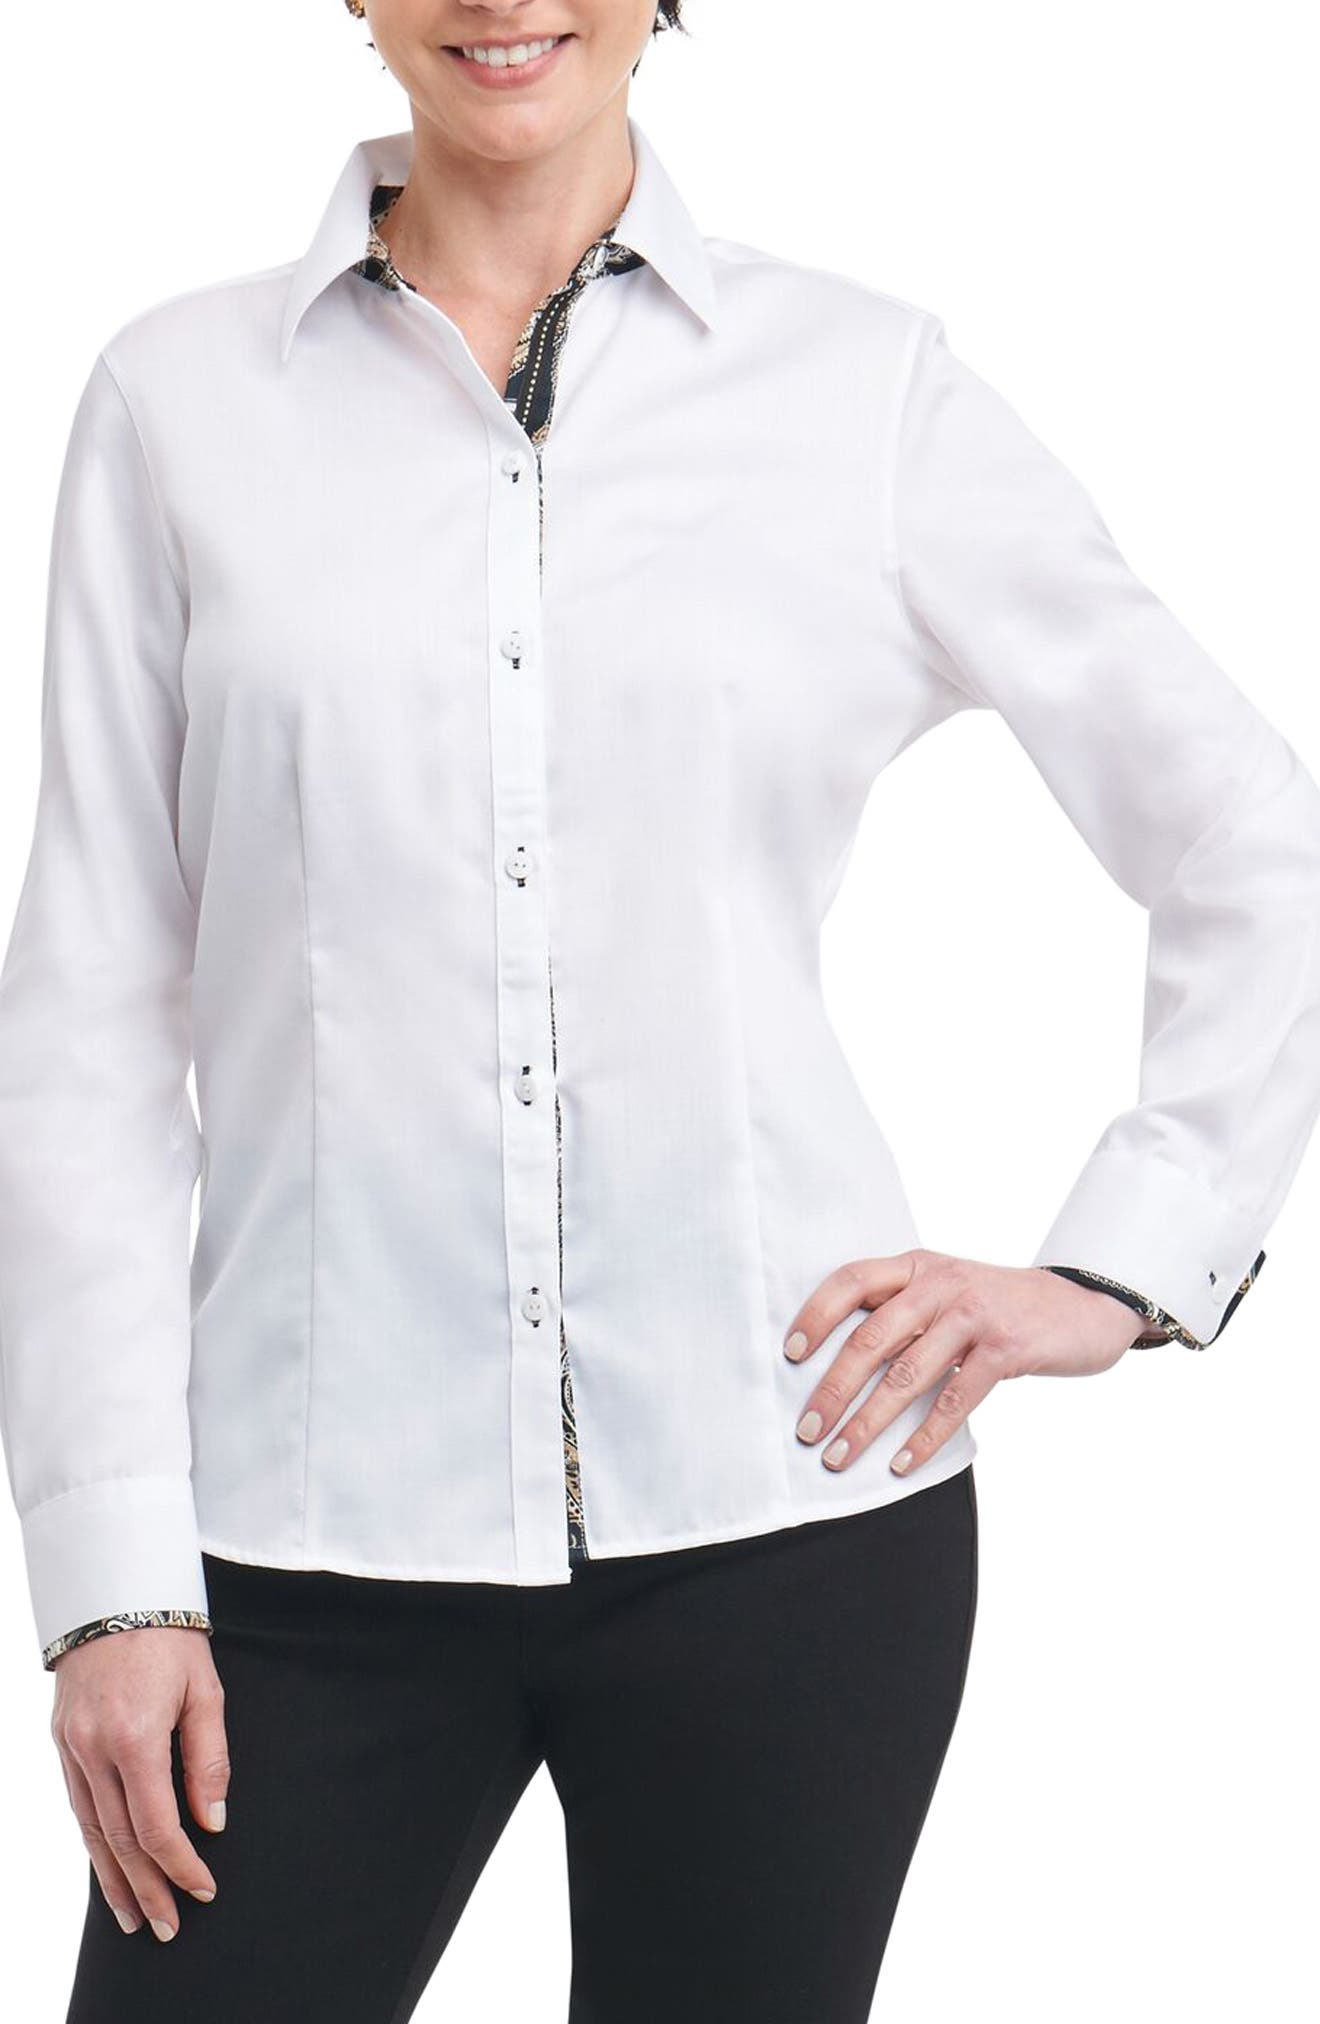 Main Image - Foxcroft Brooke Contrast Trim Sateen Shirt